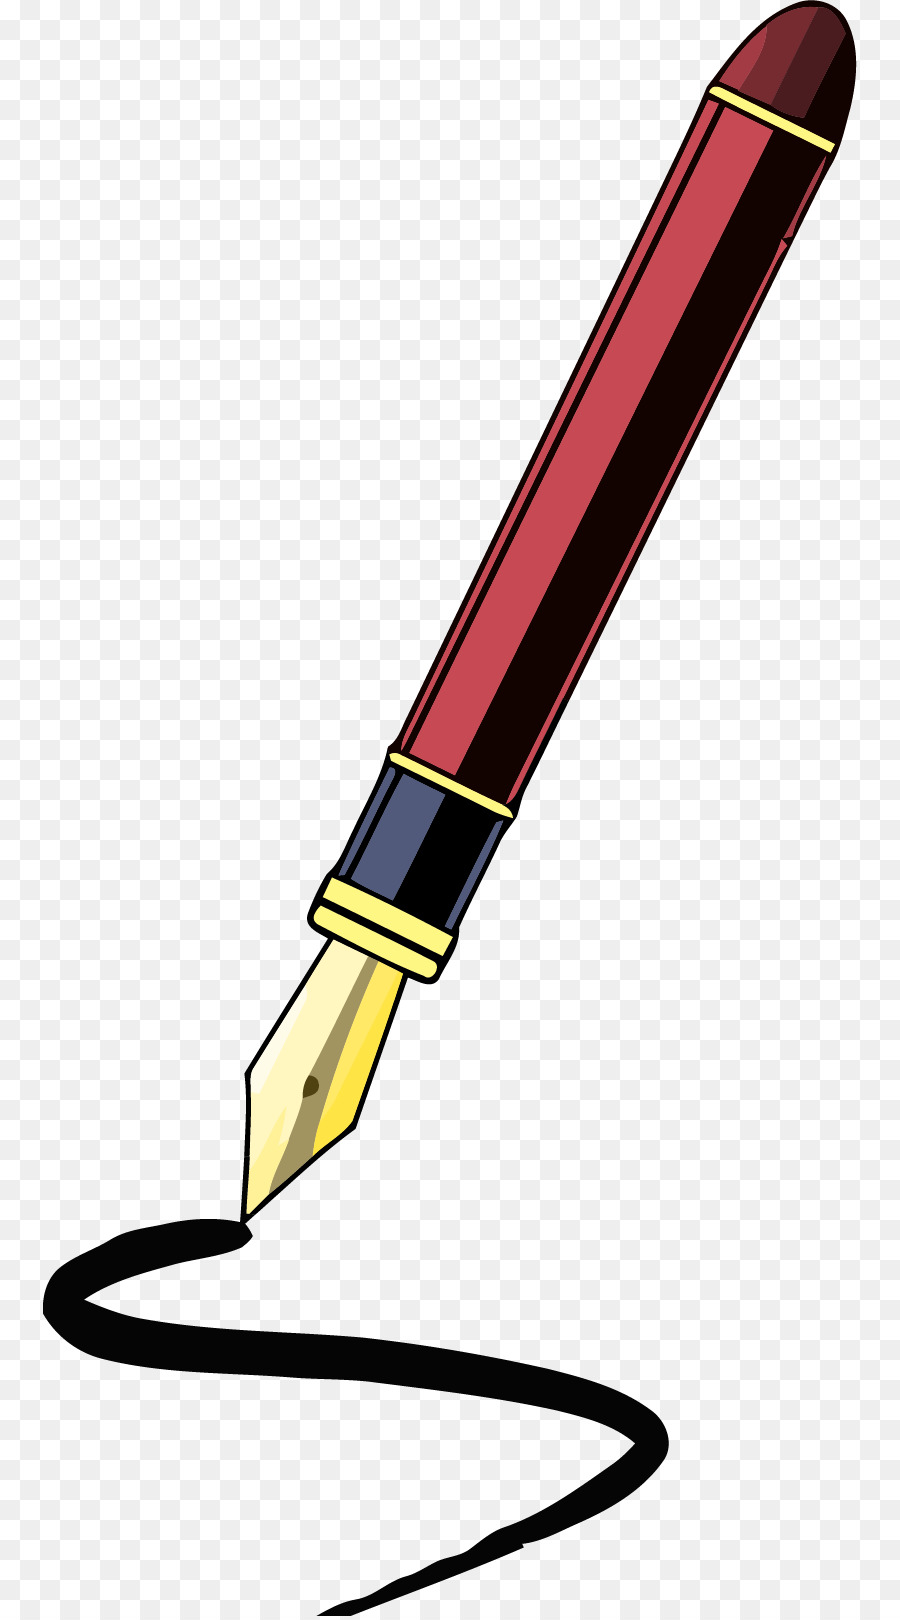 900x1620 Quill Fountain Pen Paper Clip Art